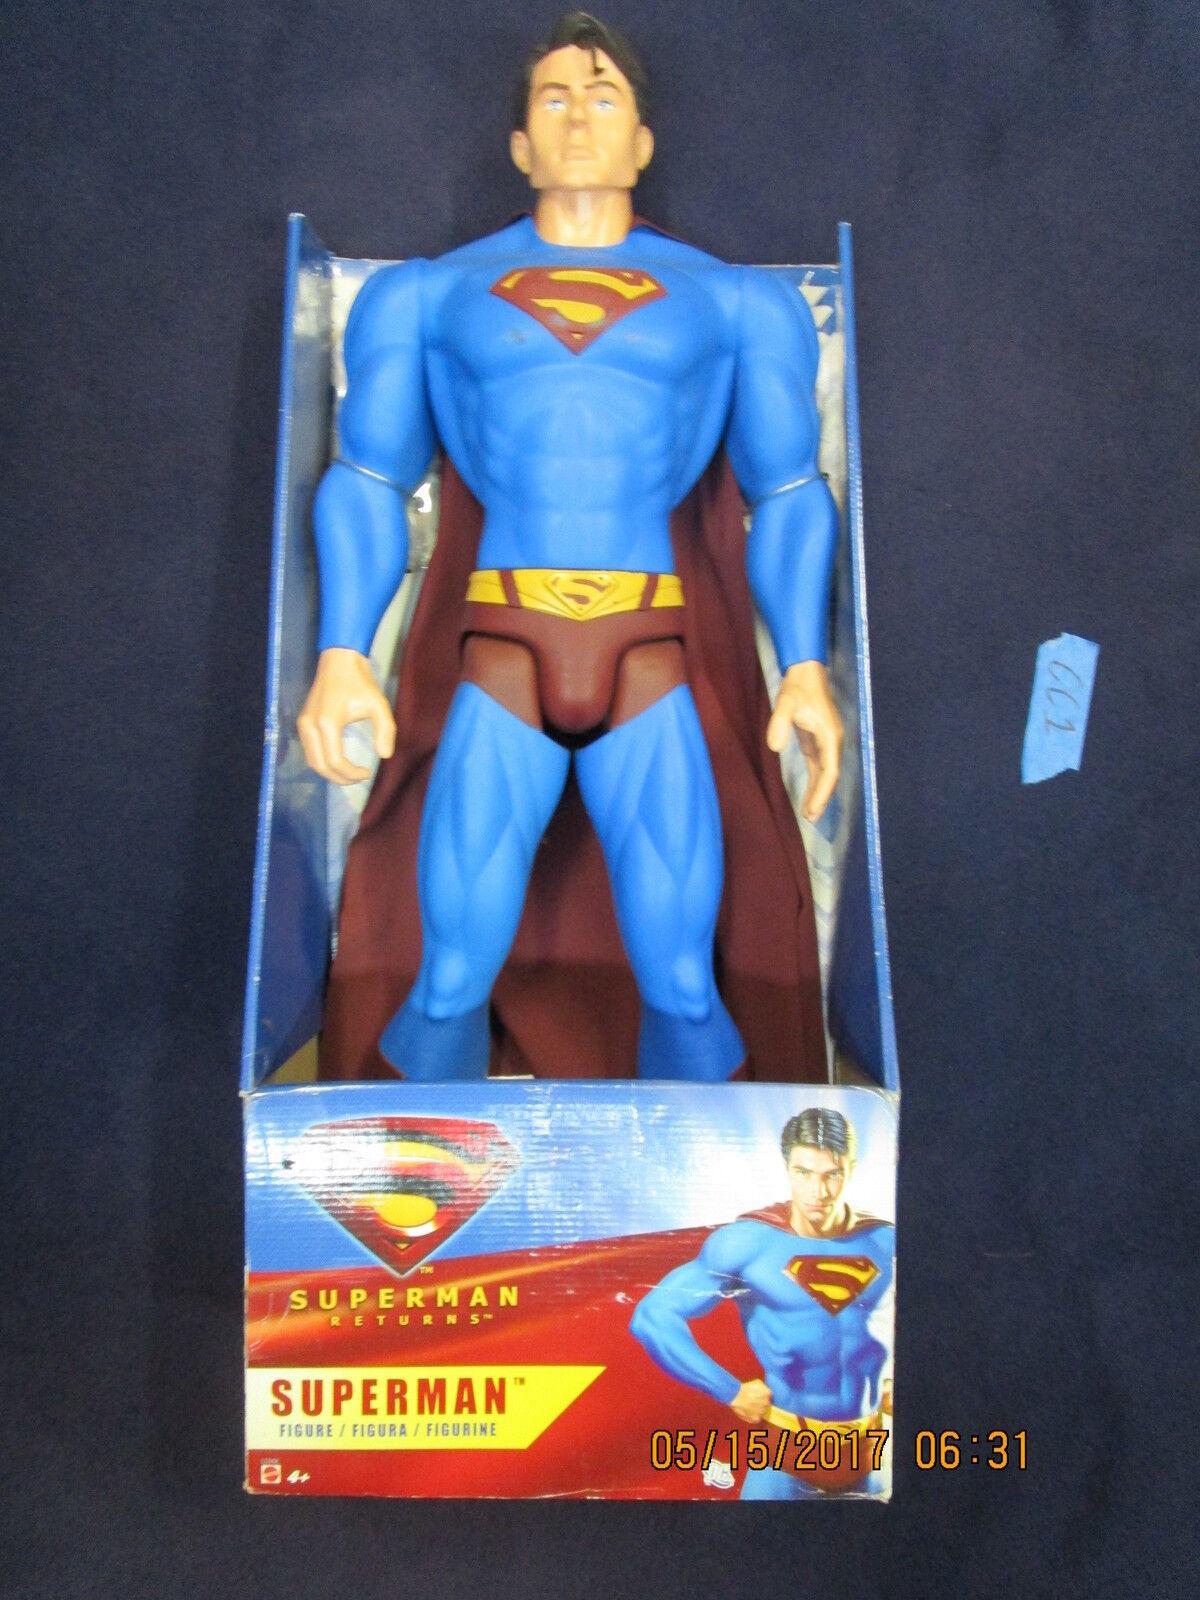 CC1_1_3 Mattel DC Movie Master Lot GIANT SUPERMAN RETURNS 30 INCH ACTION FIGURE